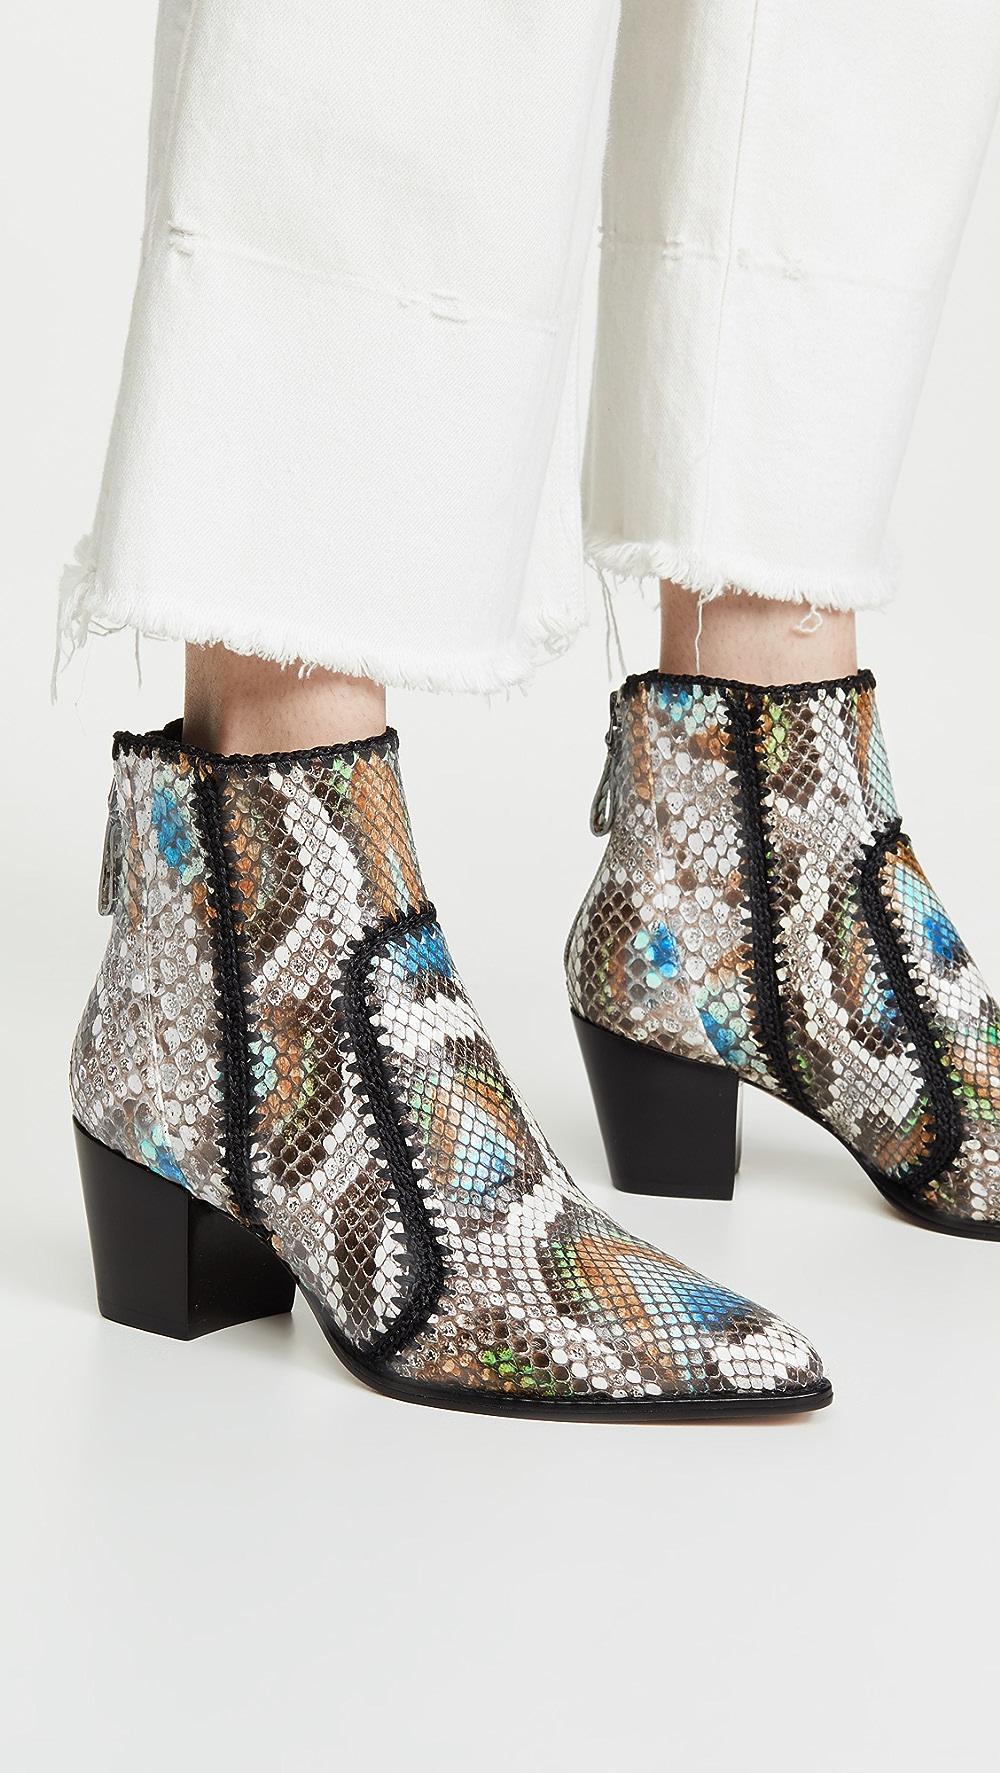 Able Alexandre Birman - Benta Python Boots Perfect In Workmanship